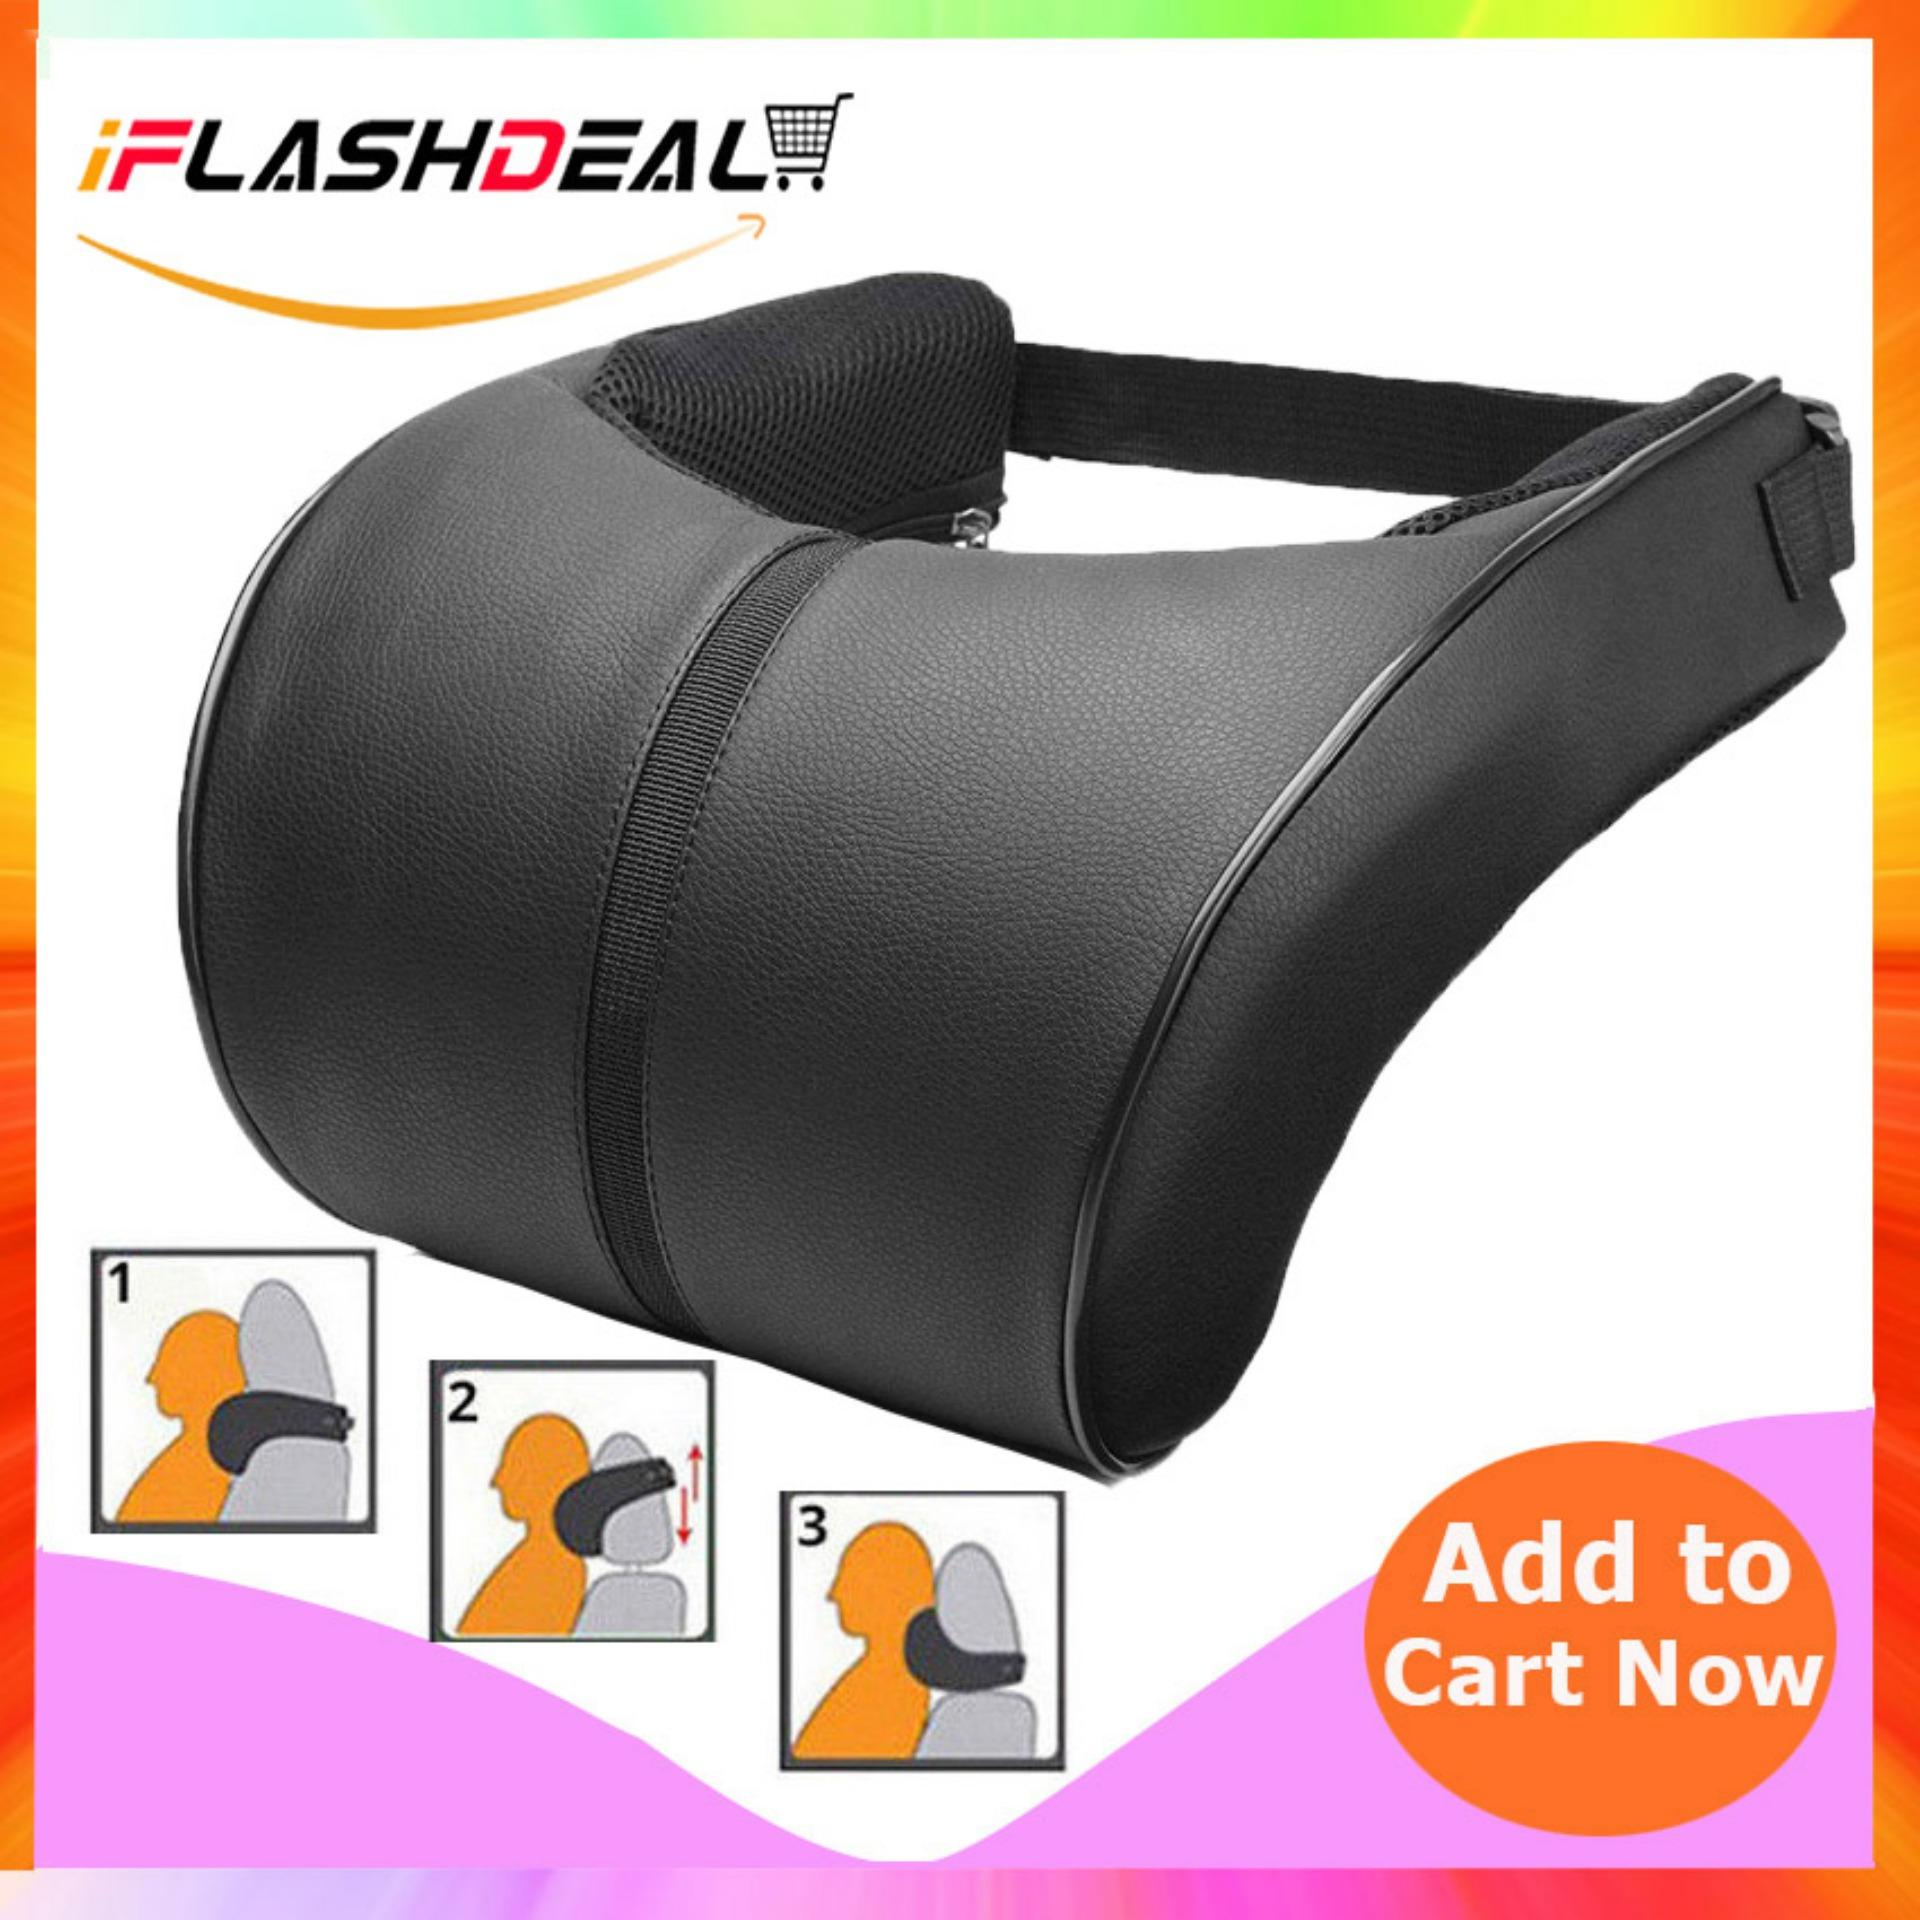 Iflashdeal Car Seat Neck Pillow Car Headrest Pillow Pu Leather Head Neck Rest Pillow Adjustable Headrest Pillow Cushion Pad By Iflashdeal.